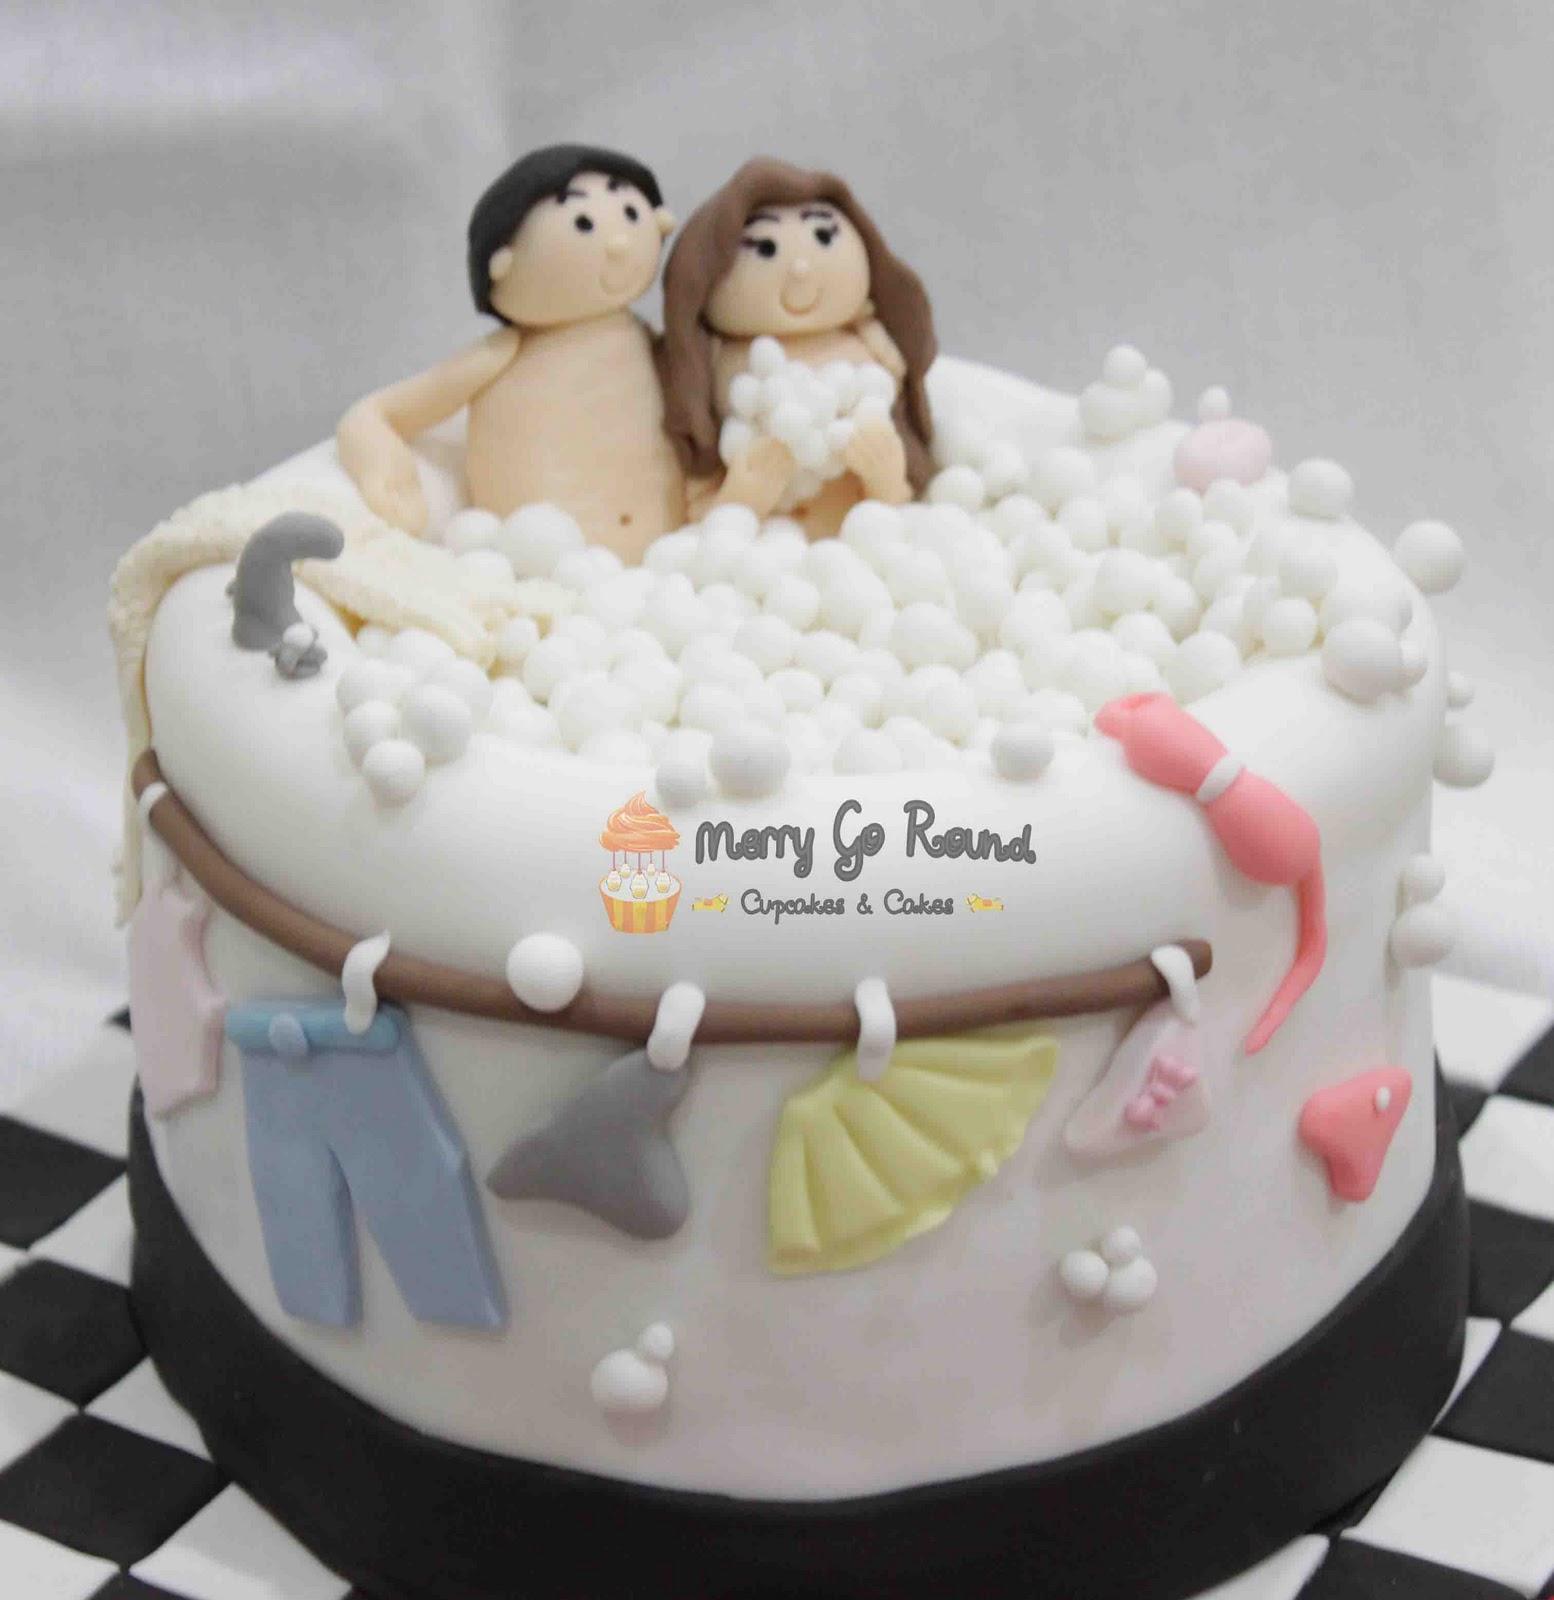 Merry Go Round  Cupcakes  Cakes Bathtub Naughty Cake